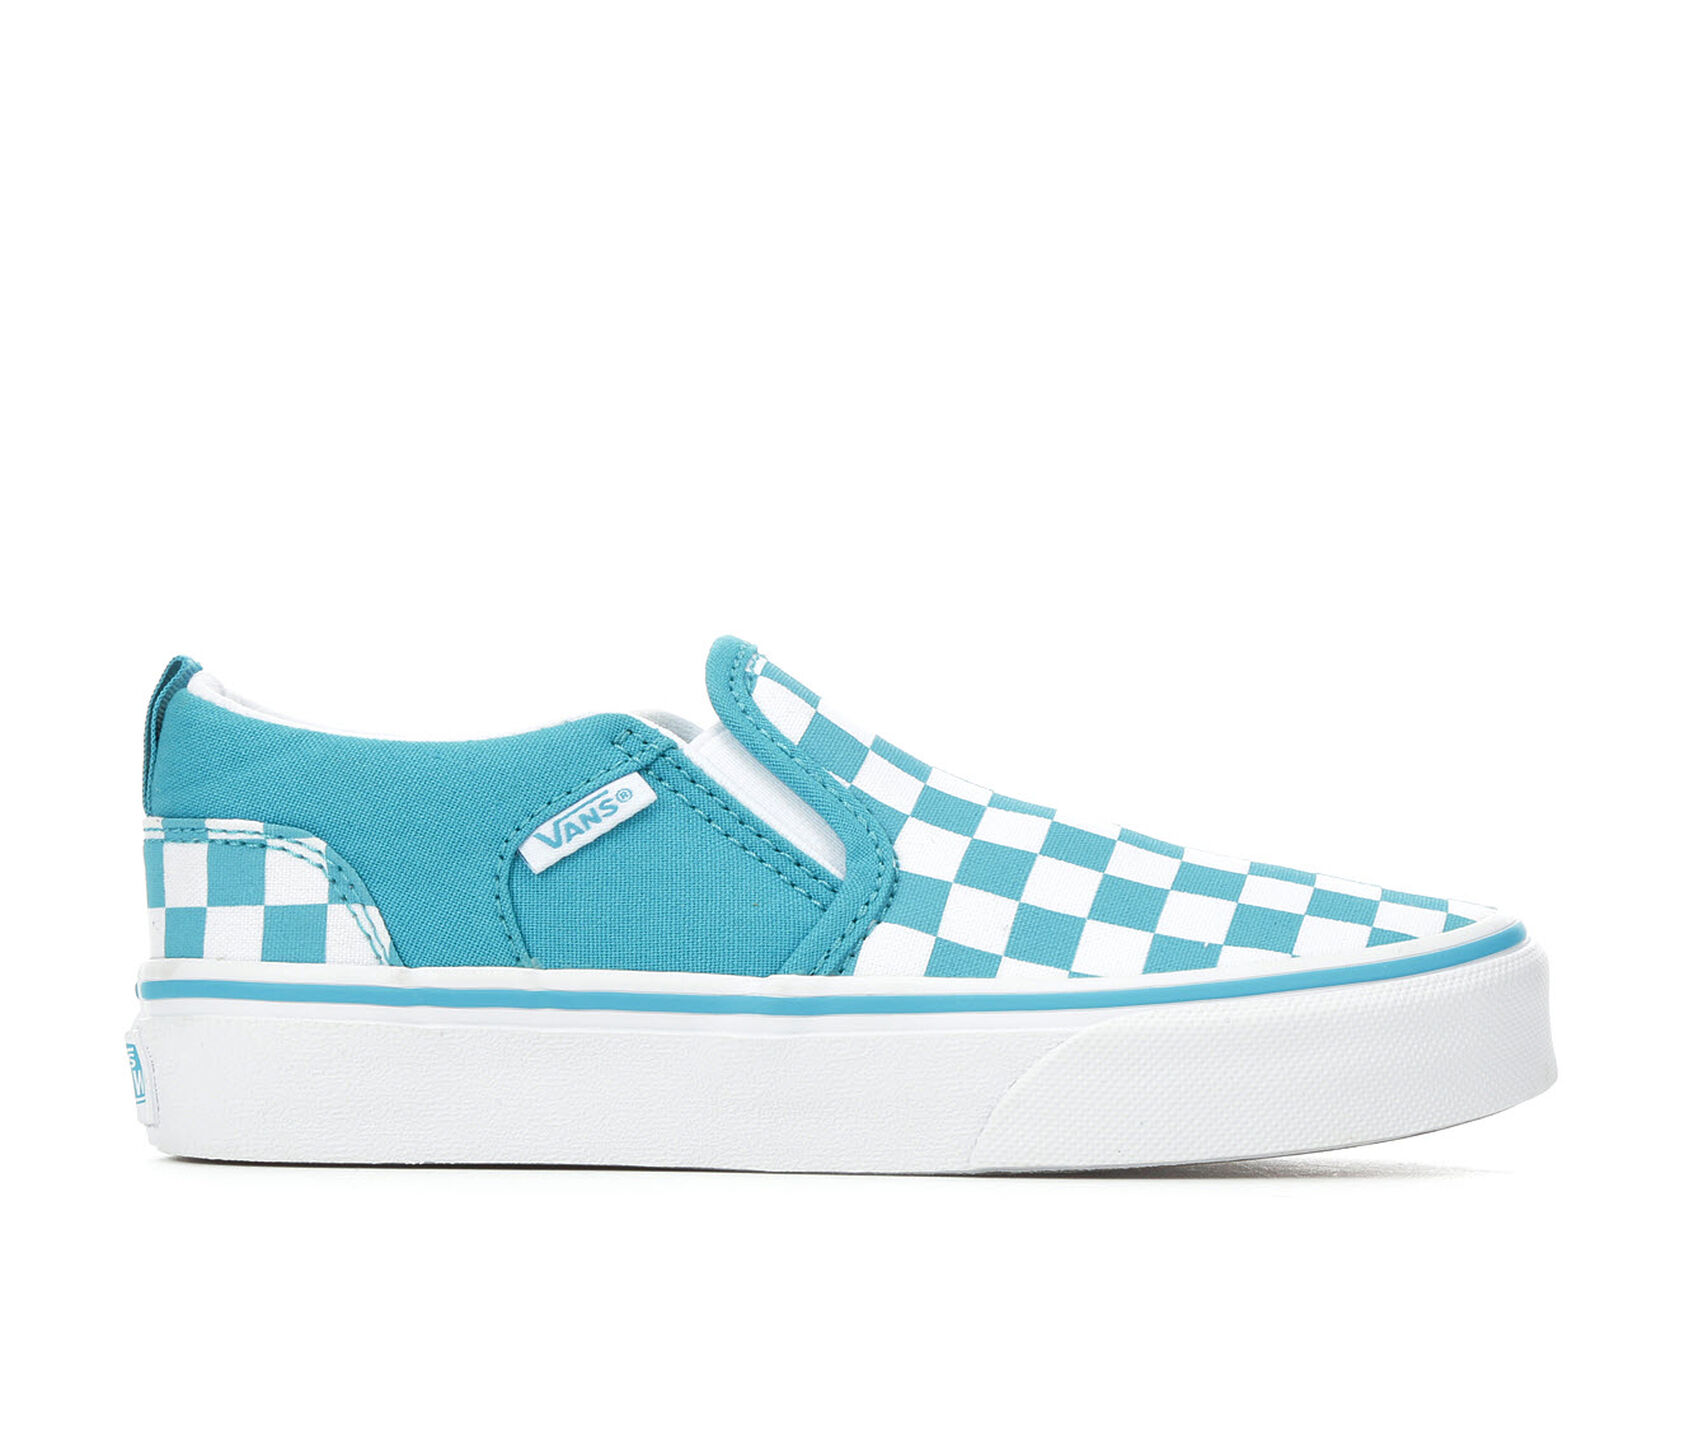 69c7fb7a8b Girls' Vans Little Kid & Big Kid Asher Slip-On Skate Shoes